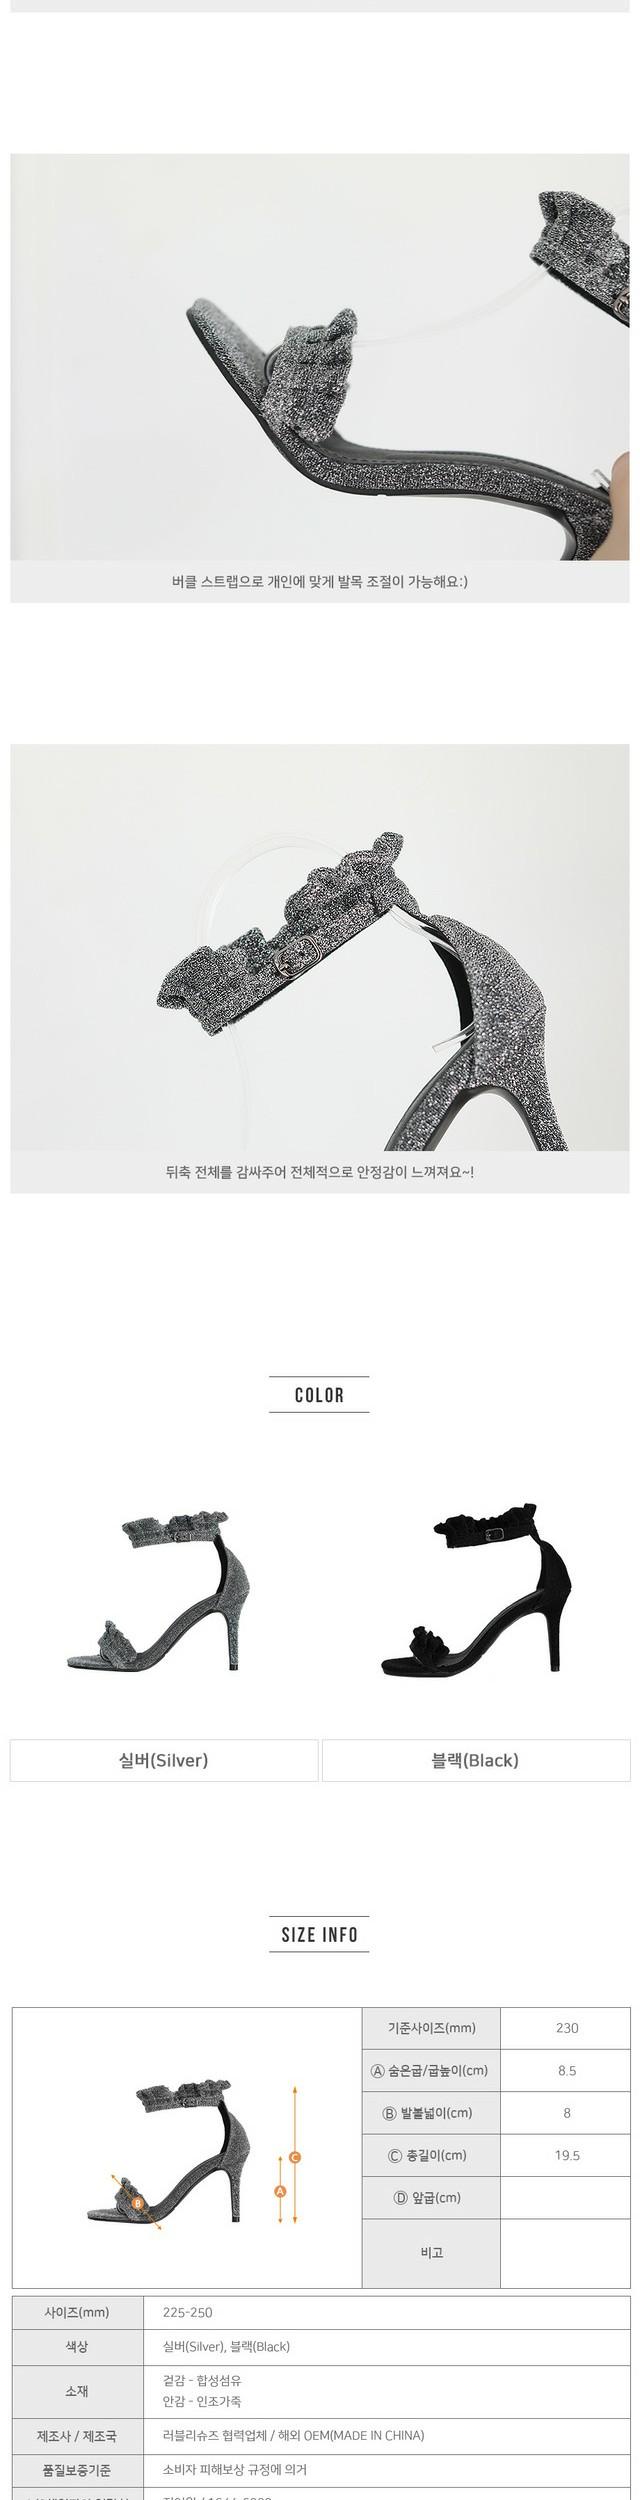 Peugeot buckle strap sandal heel 8.5cm